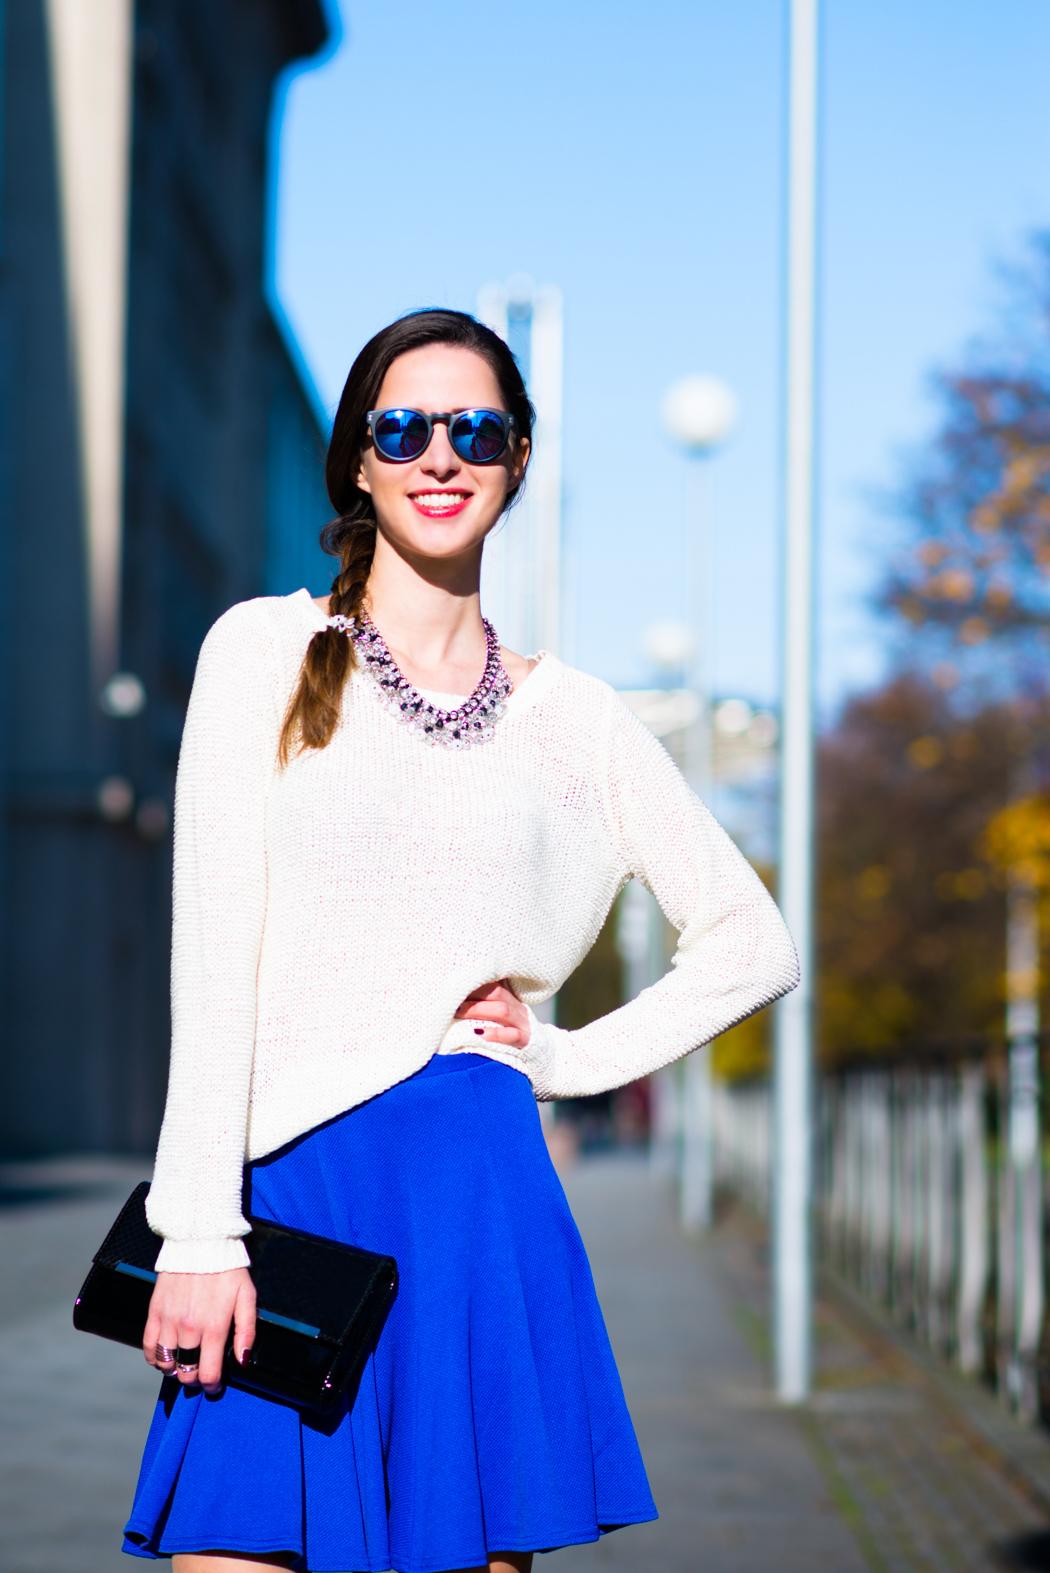 Blue-Skirt-Biker-Boots-Blugirl-Fashionblogger-Deutschland-1